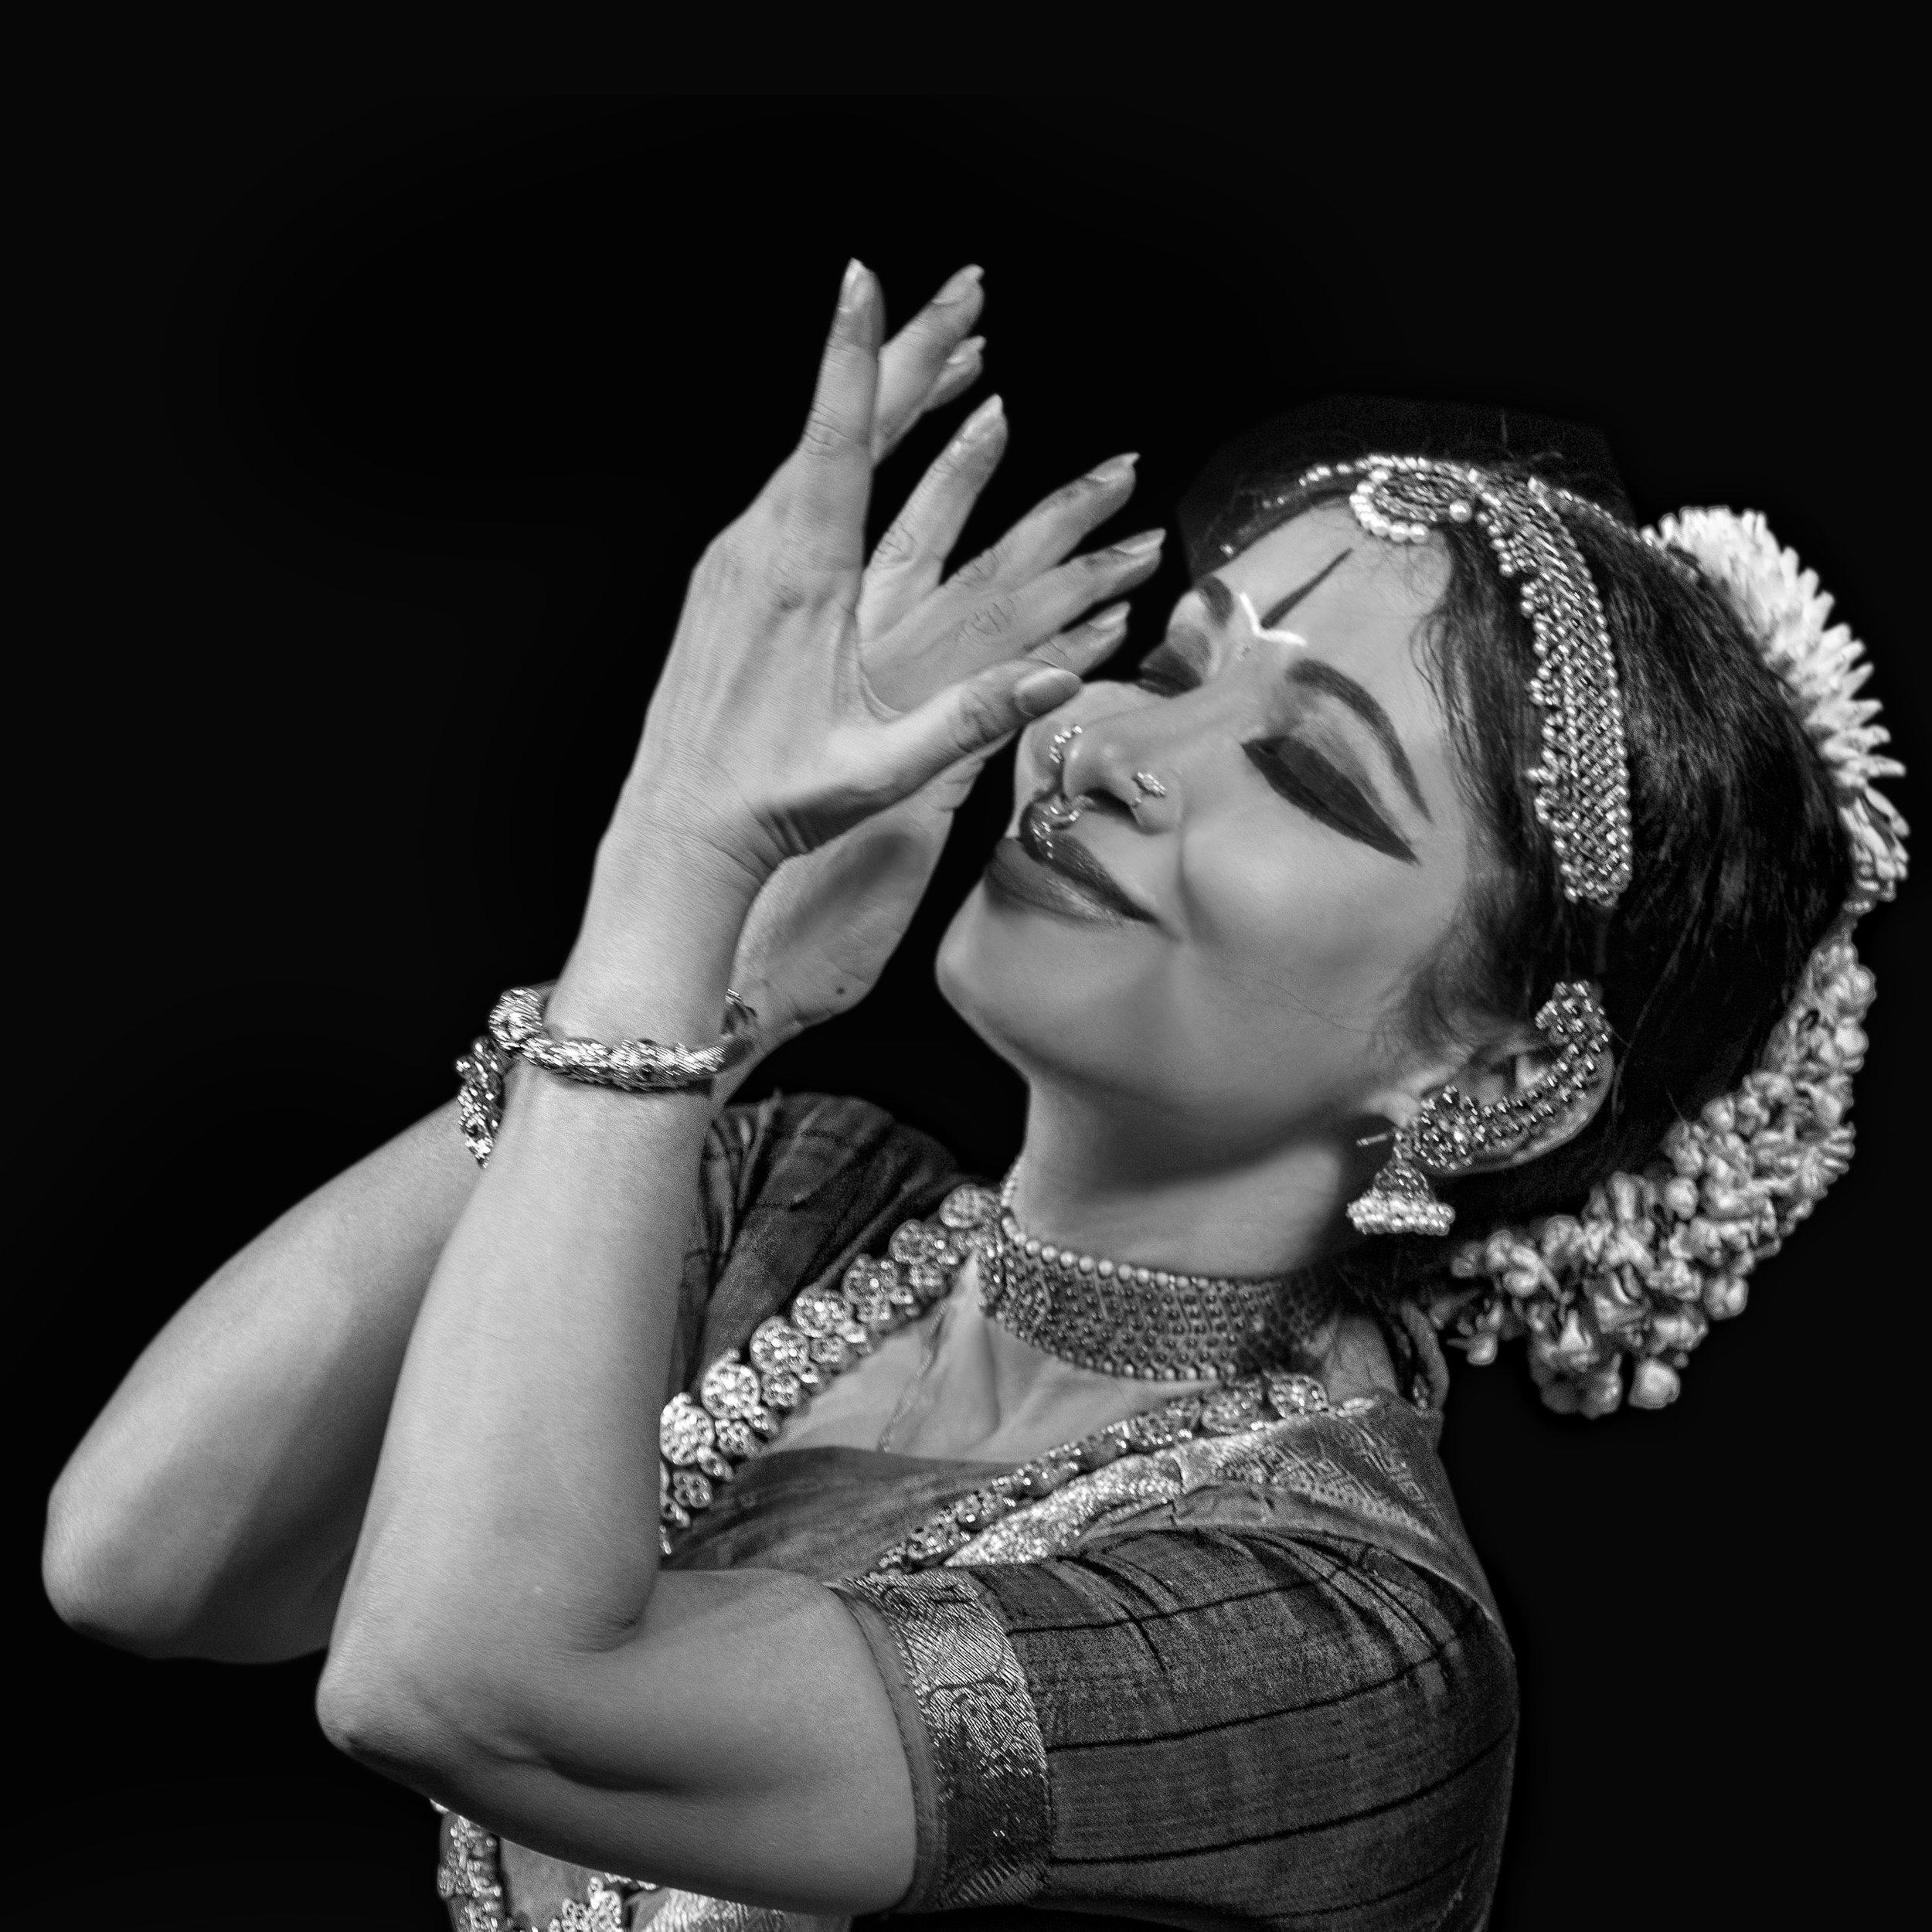 Artist Talk: Padma Bhushan Smt. Alarmél Valli